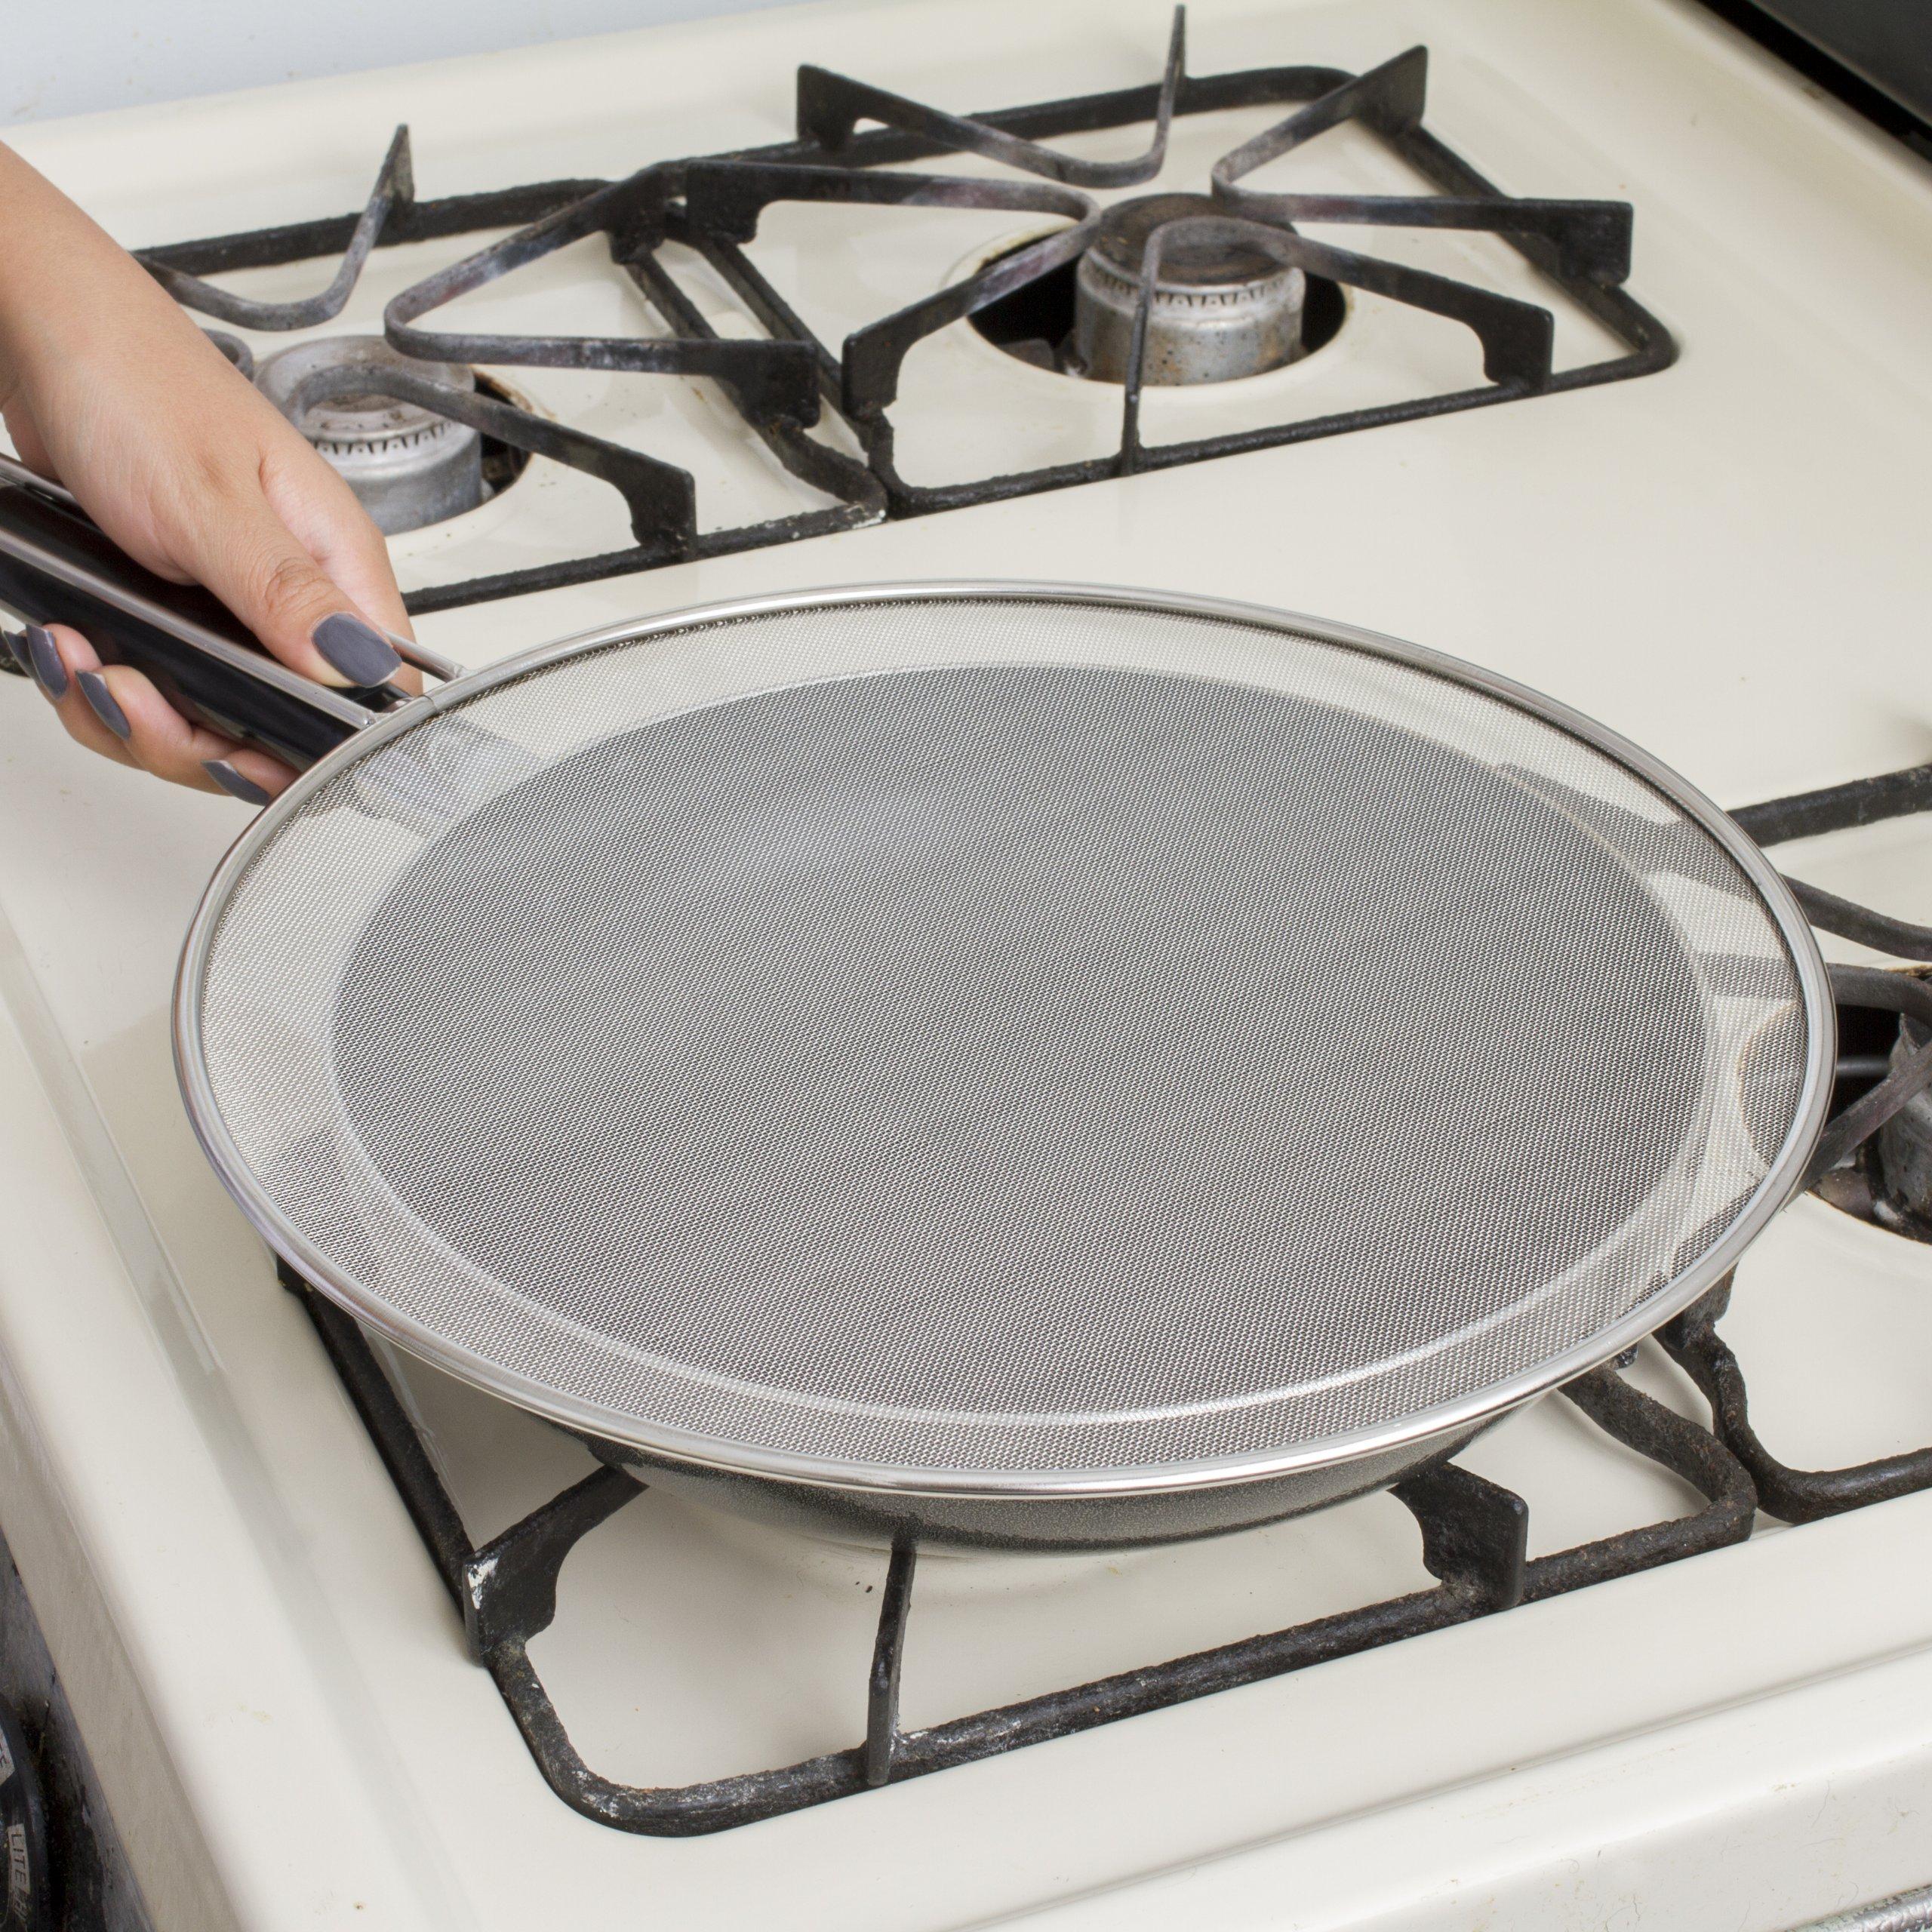 Kitchen Basics 3-Piece Stainless Steel Spatter Screens